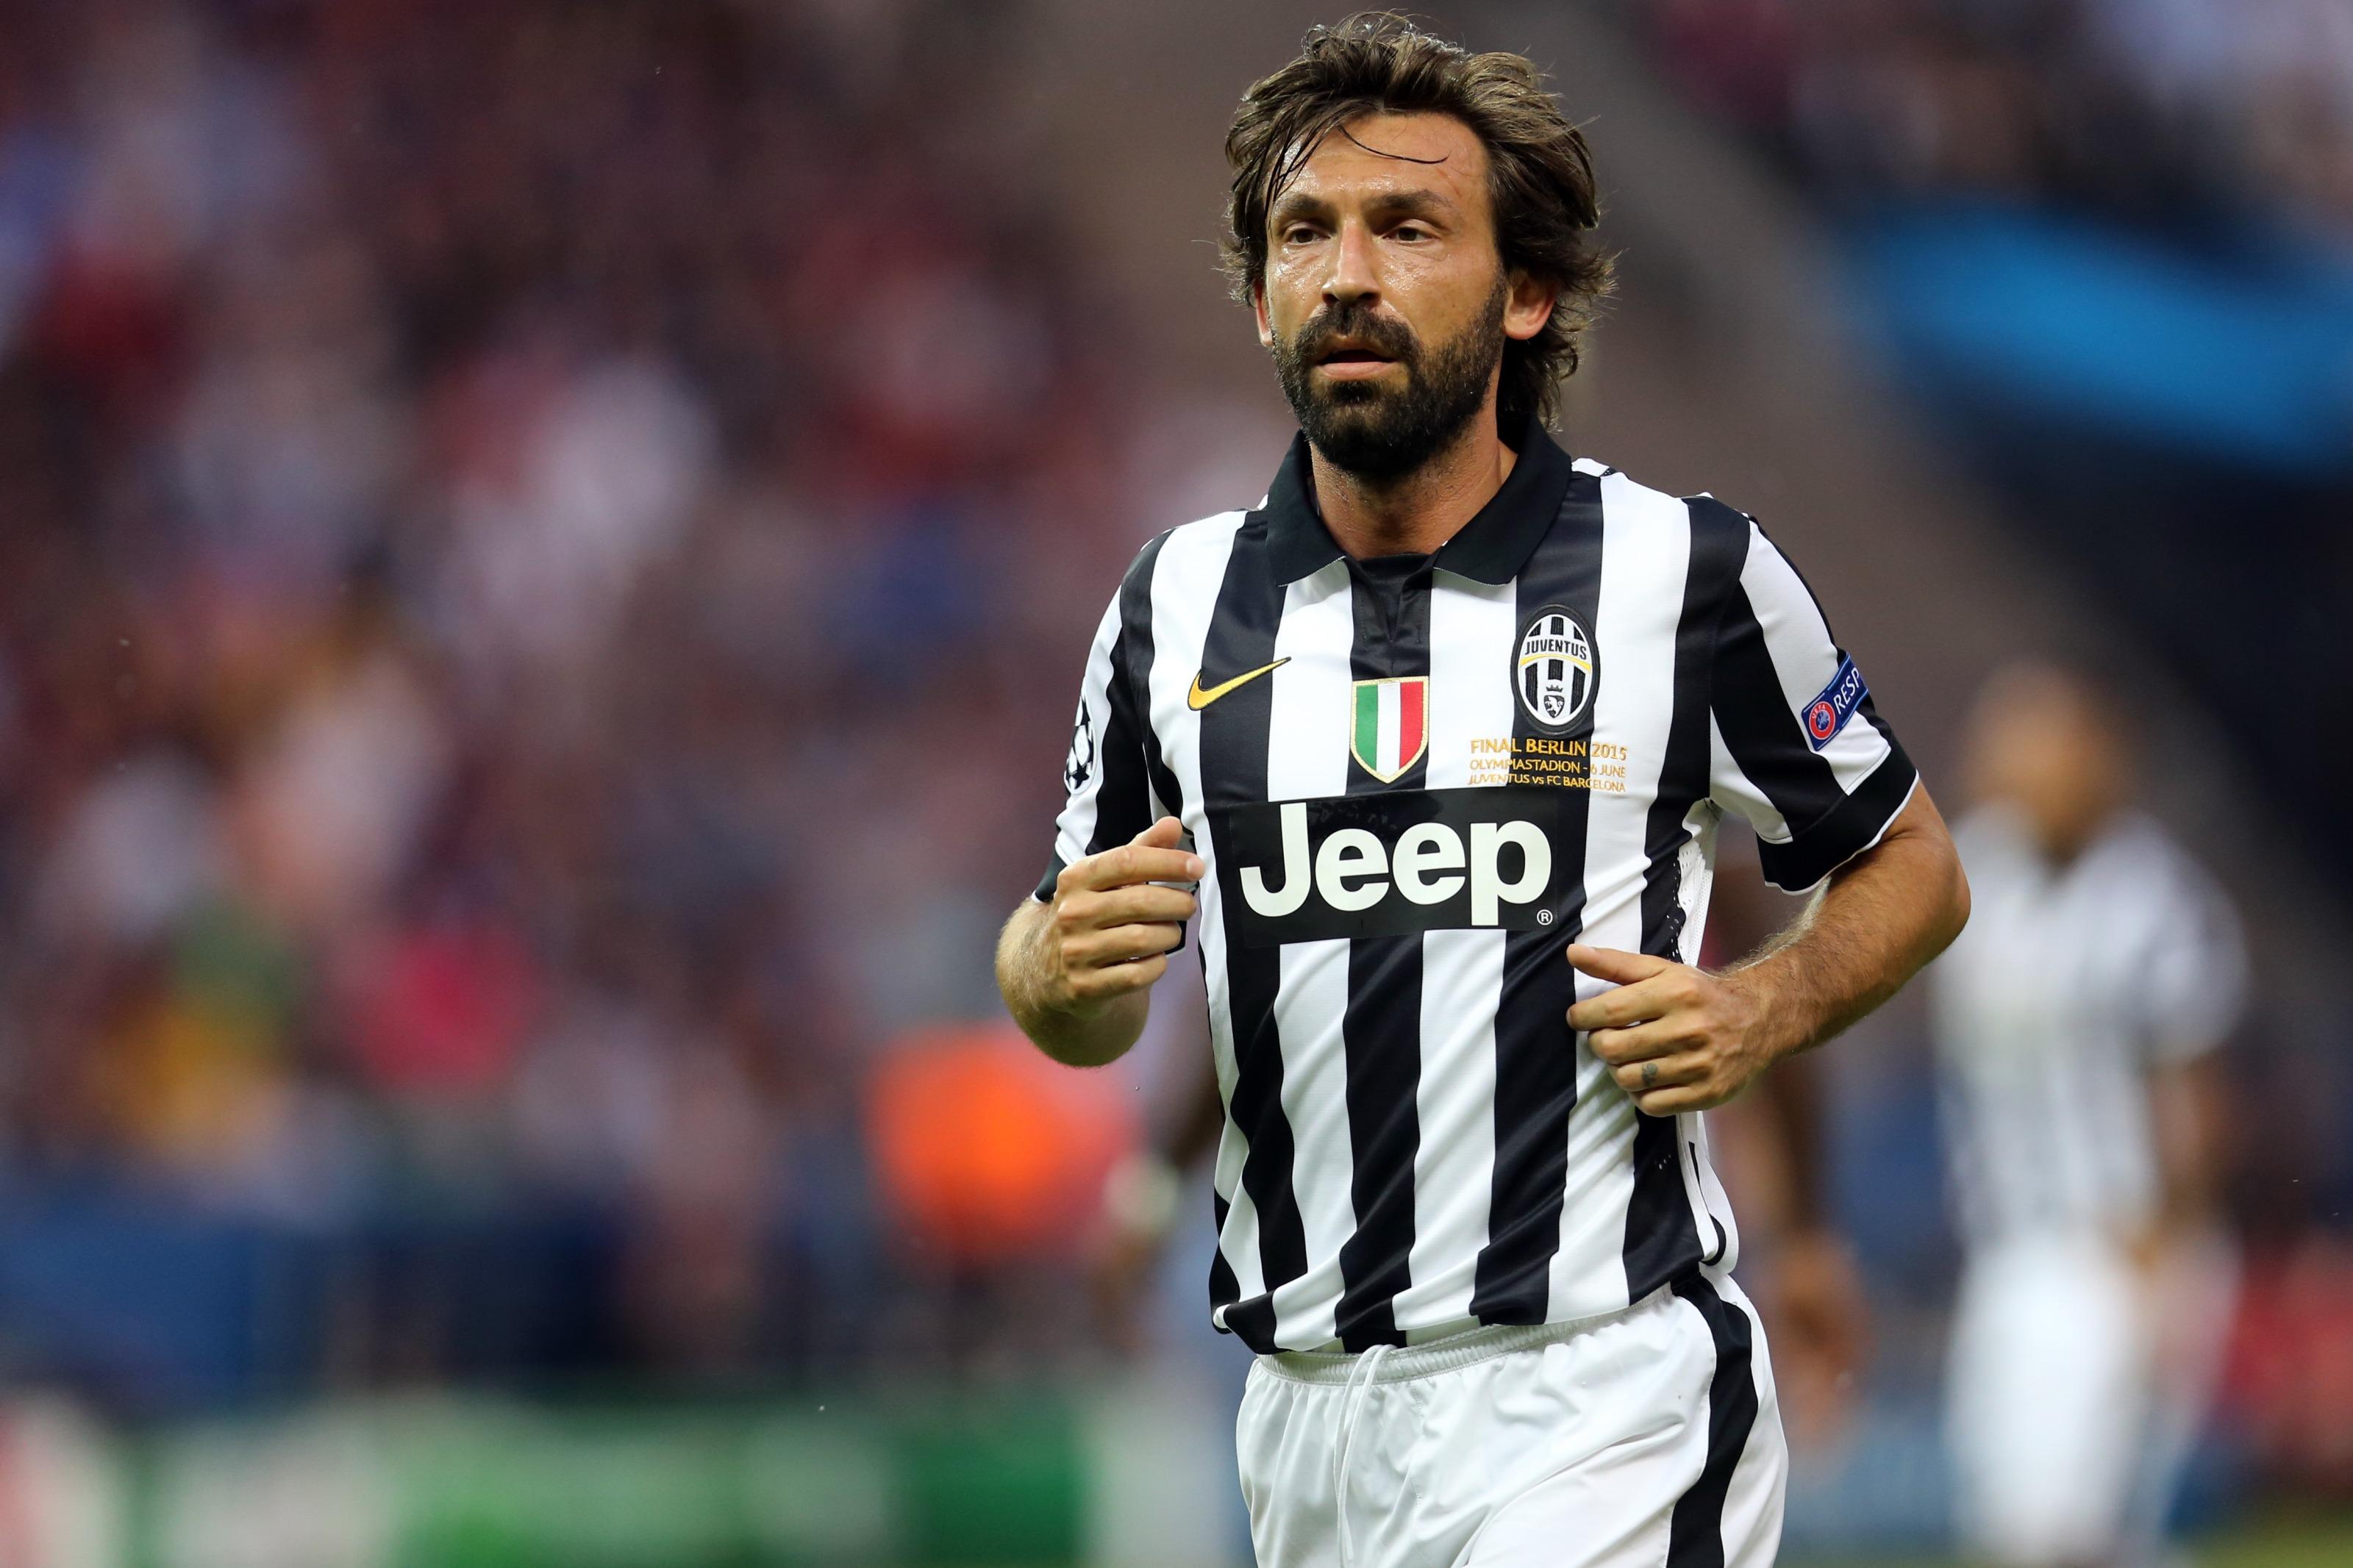 Juventus Andrea Pirlo Rejoining Bianconeri As U 23 Coach